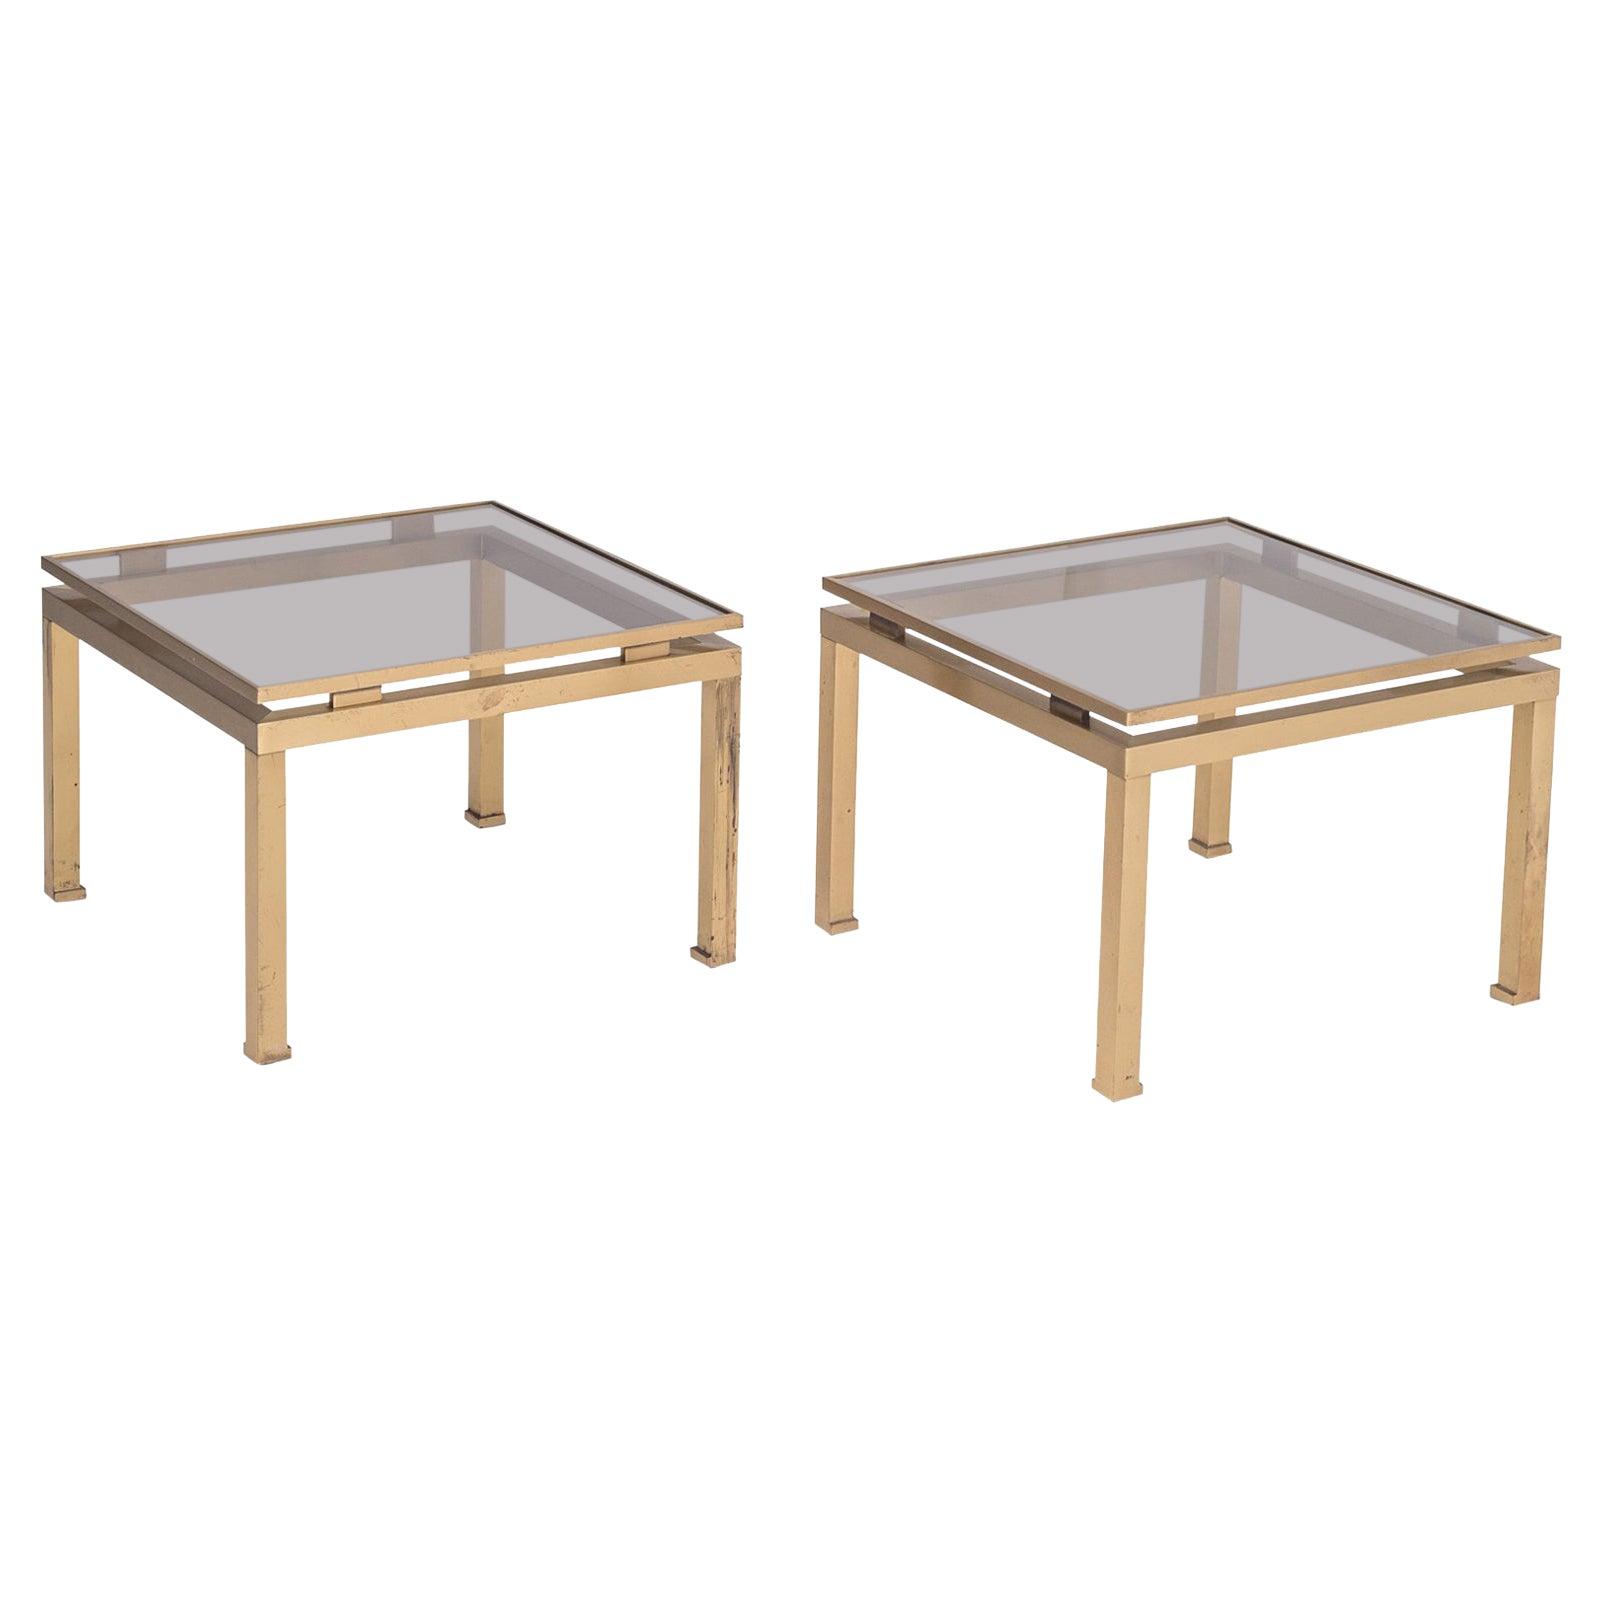 Brass Side Tables by Guy Lefevre for Maison Jansen